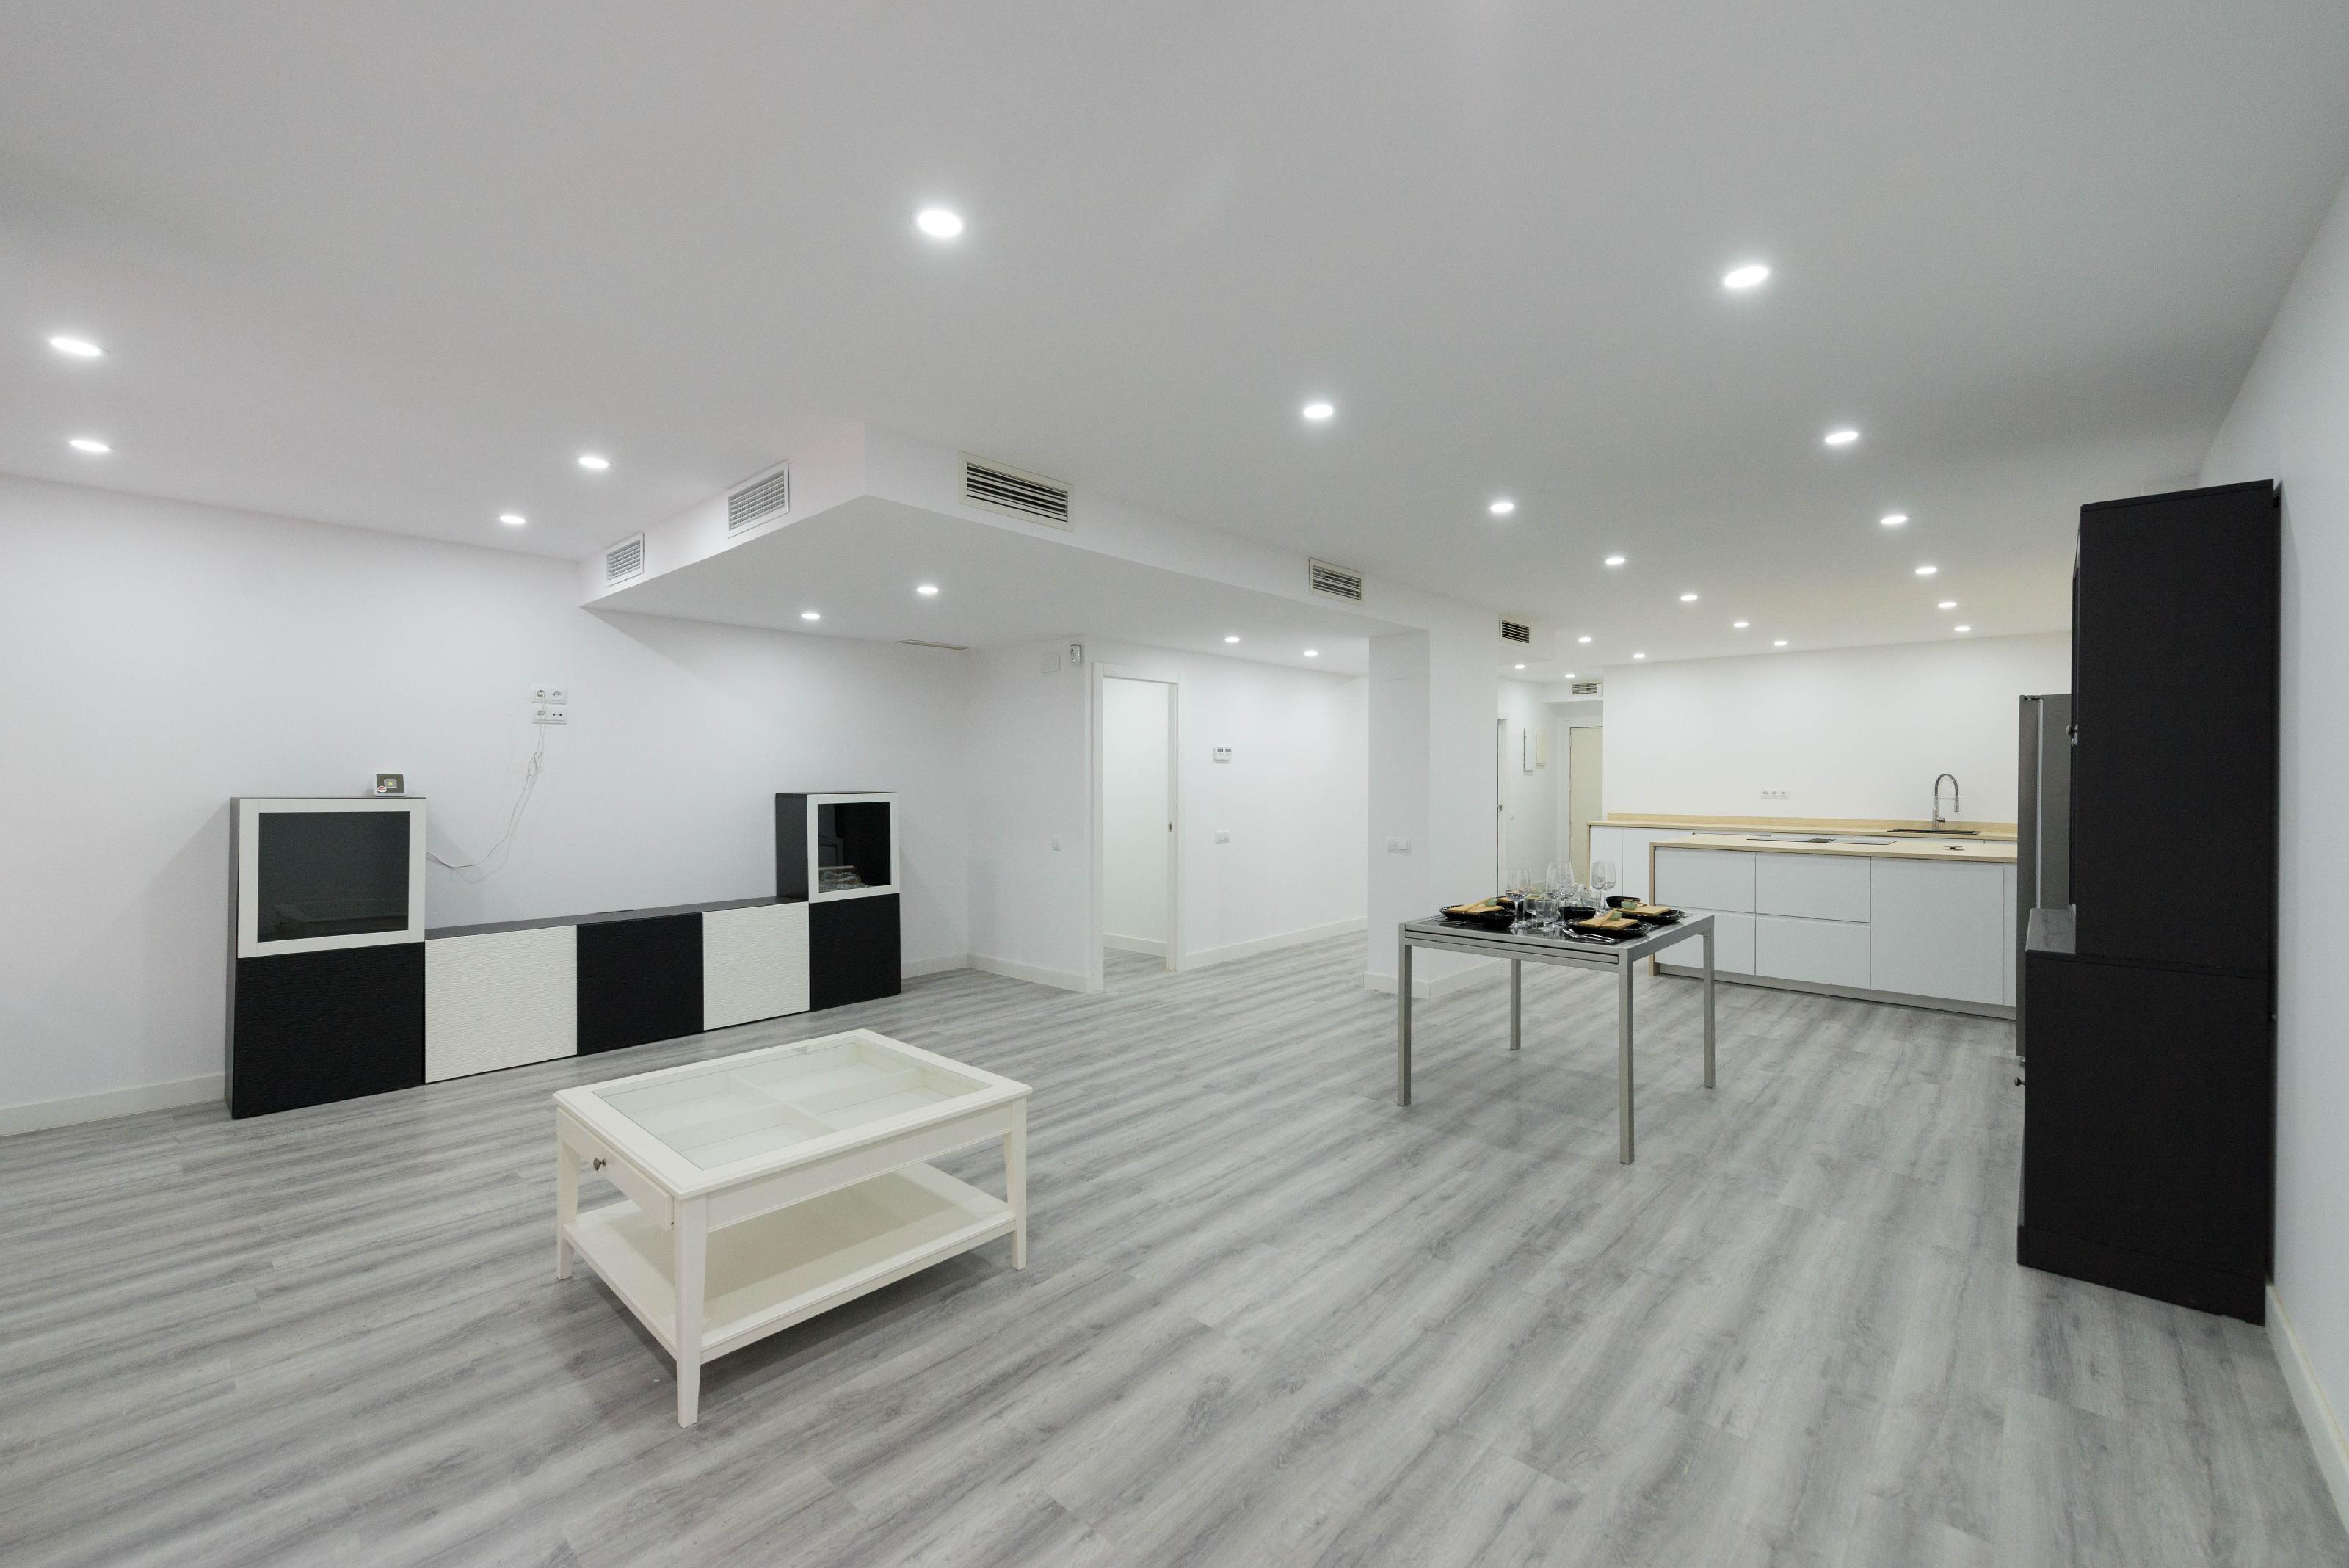 242980 Flat for sale in Eixample, Sagrada Familia 7